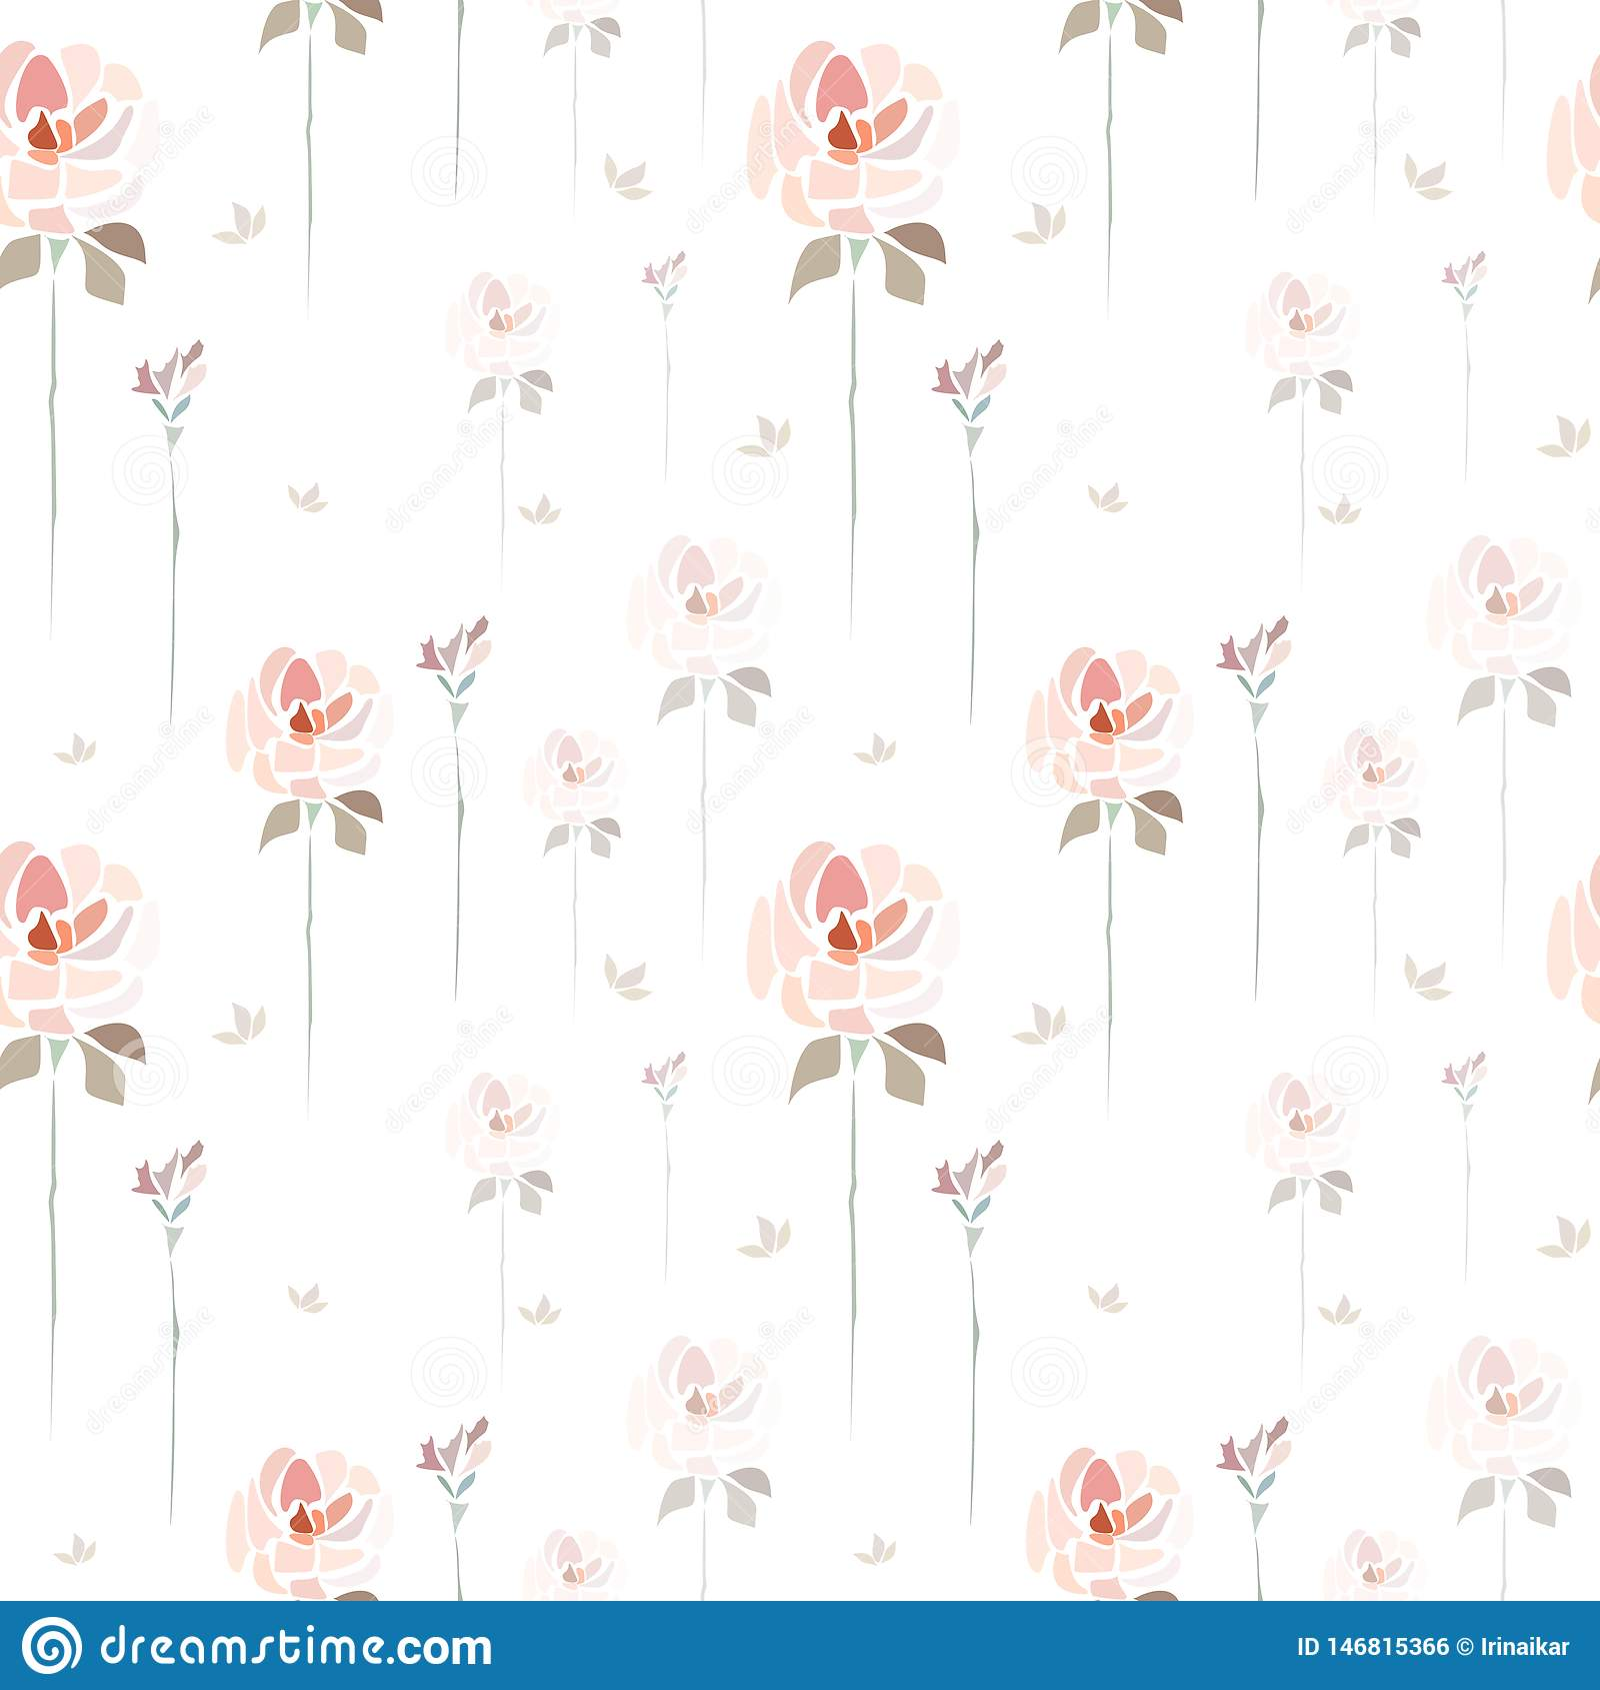 Handgezogene rosa Rosenblumen auf wei?em Hintergrund wie Aquarellmalerei